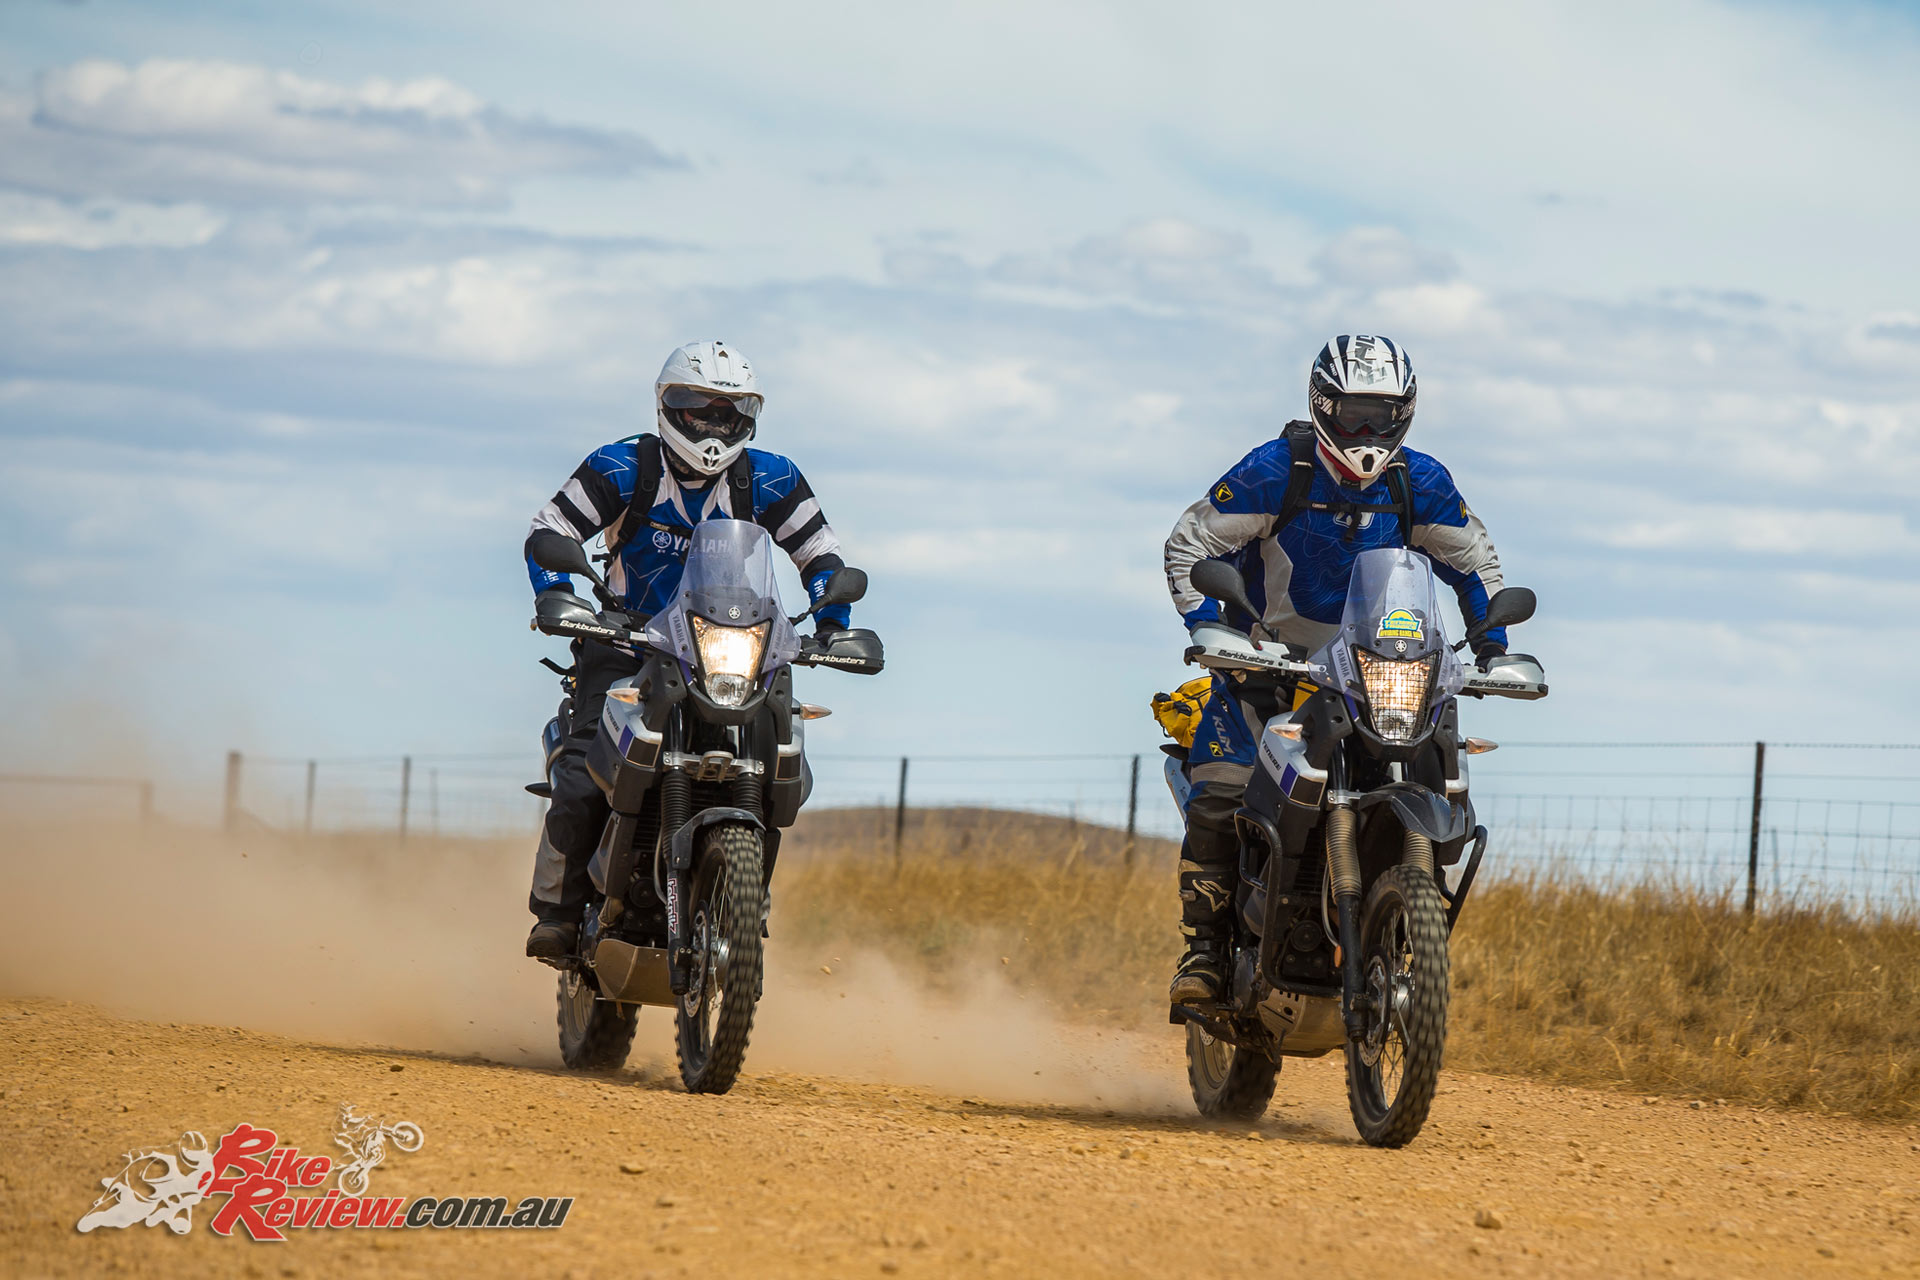 Yamaha Super Tenere Review >> Review: 2016 Yamaha Tenere XTZ660 - Bike Review